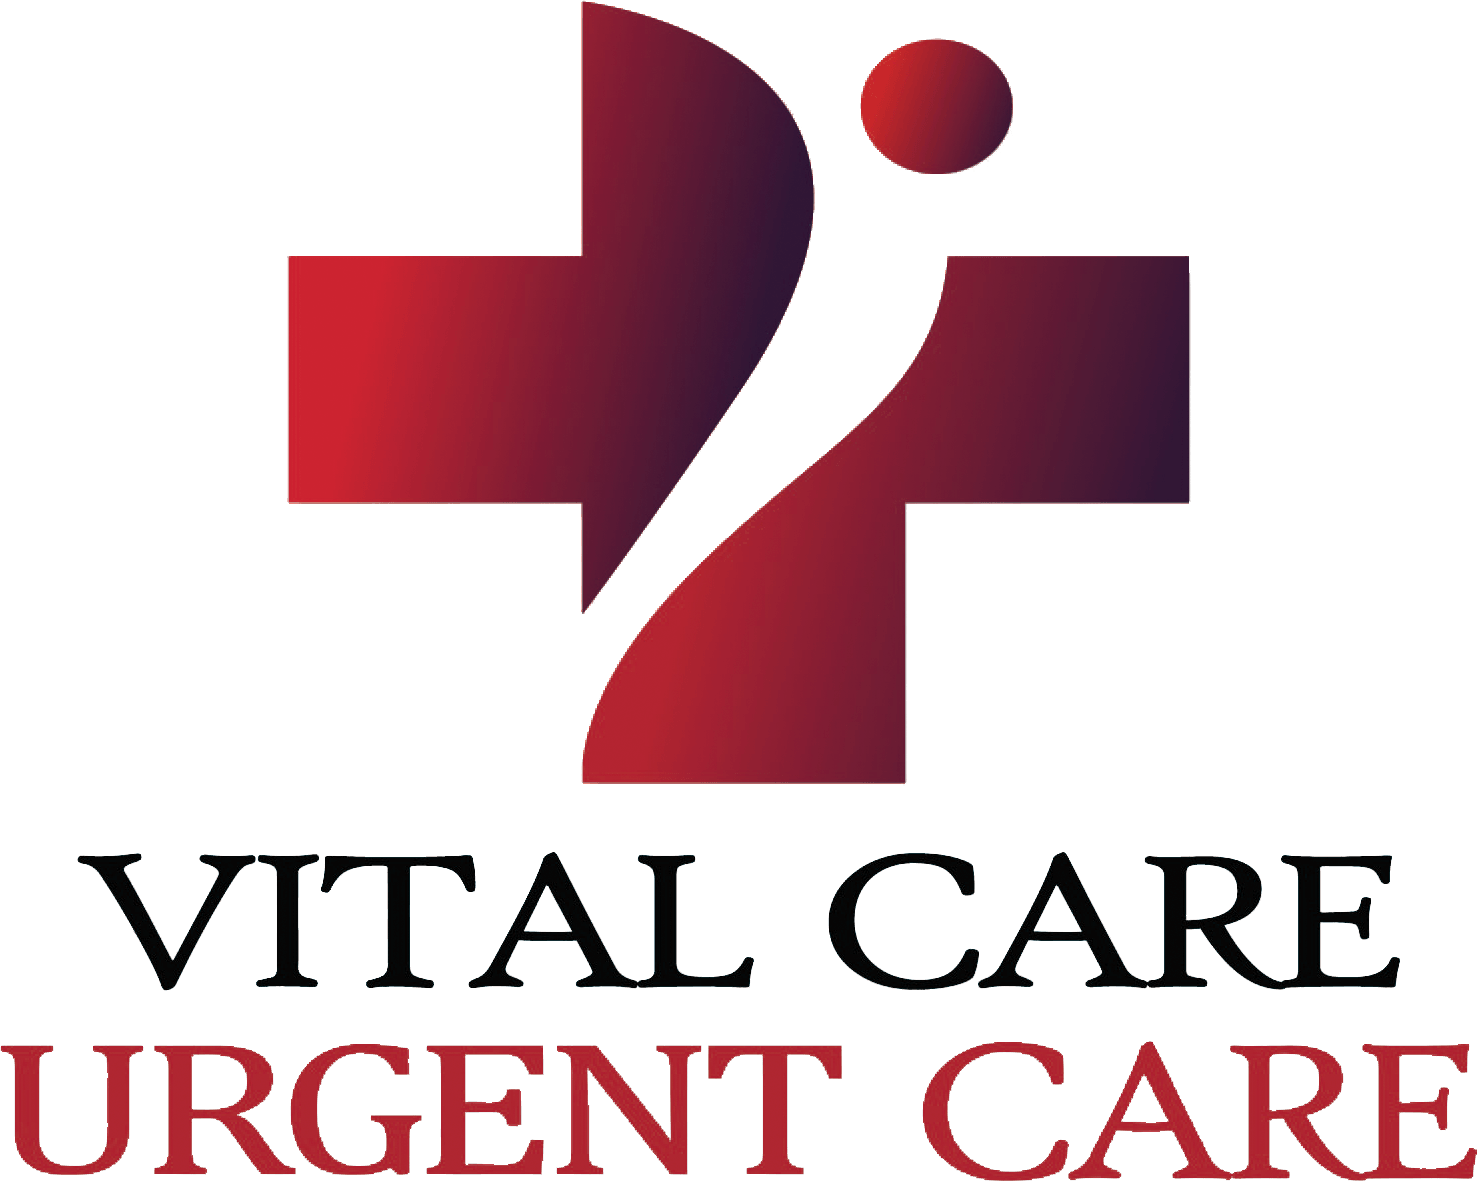 Urgent Care Clinic Midland Odessa Killeen Tx Vital Care